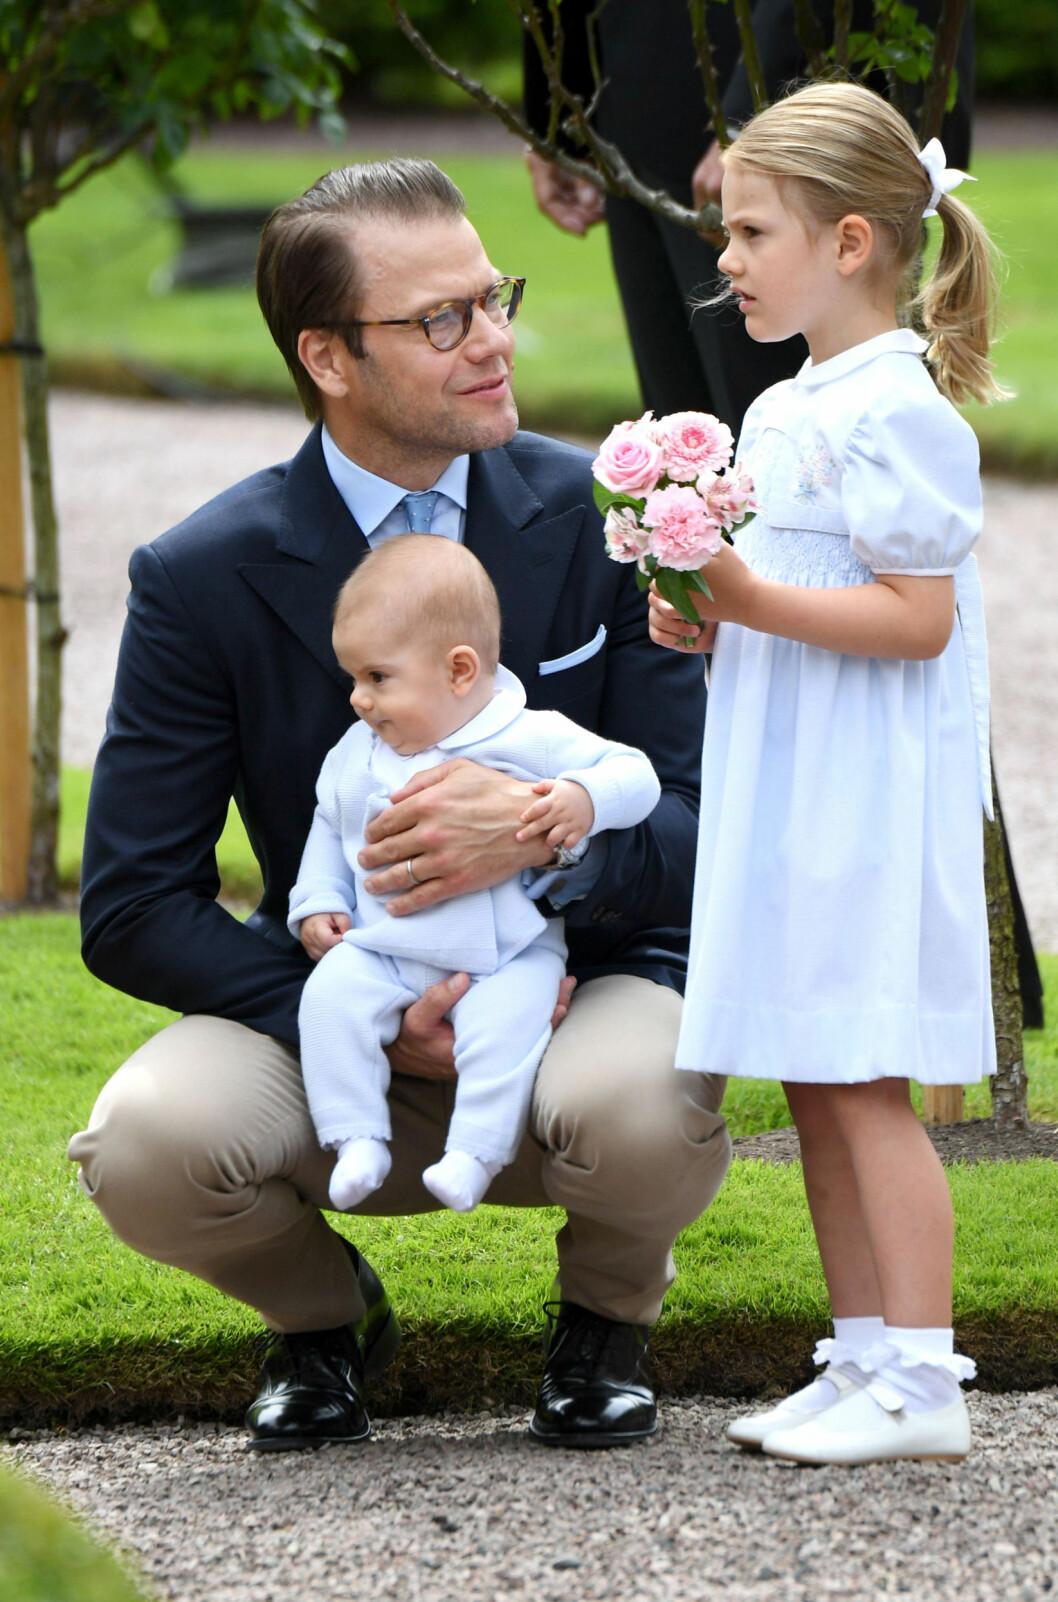 ELSKER FARSROLLEN: Prins Daniel av Sverige forguder sine to barn prinsesse Estelle og prins Oscar. Foto: NTB Scanpix